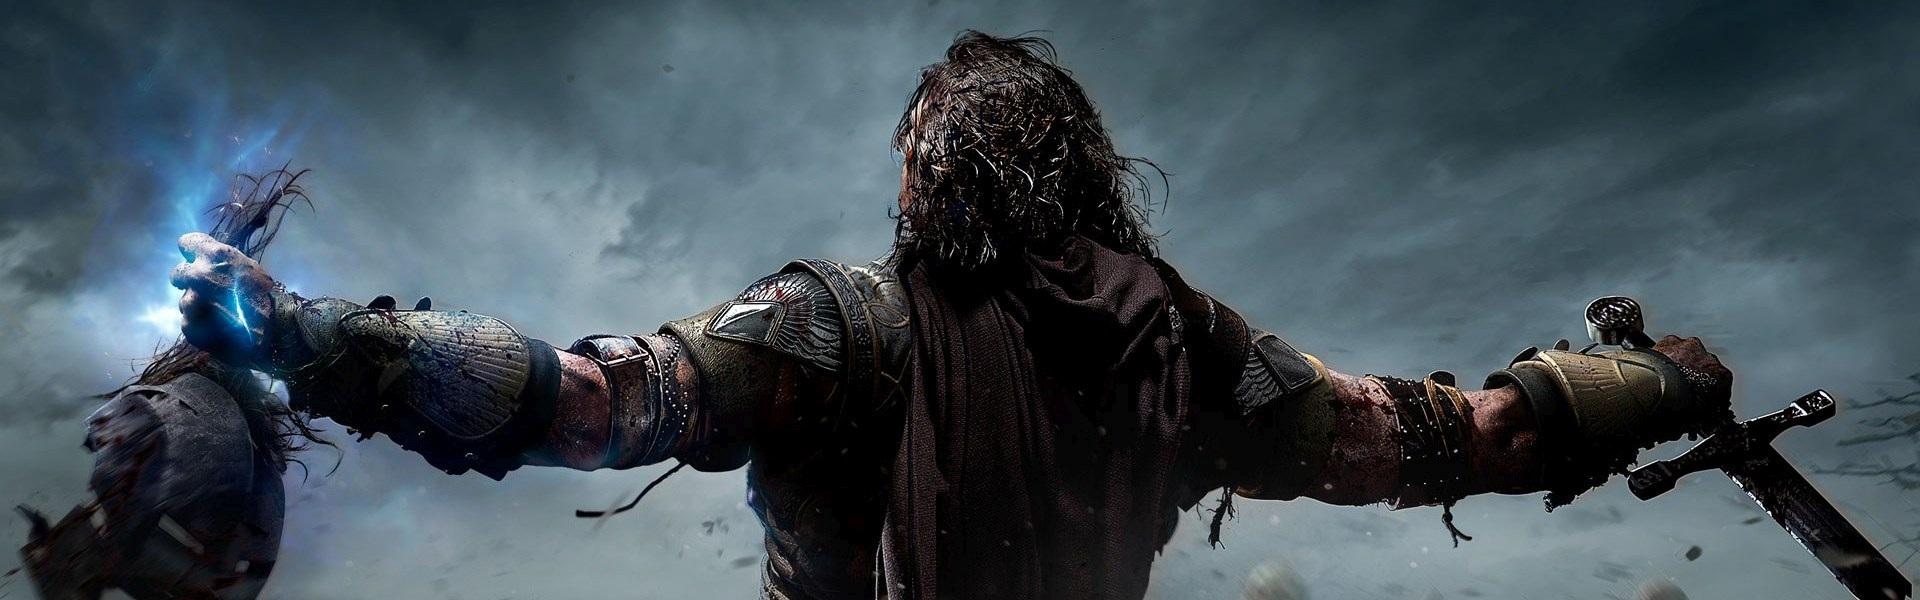 Middle-earth: Shadow of Mordor - Season Pass (DLC) Steam Key GLOBAL